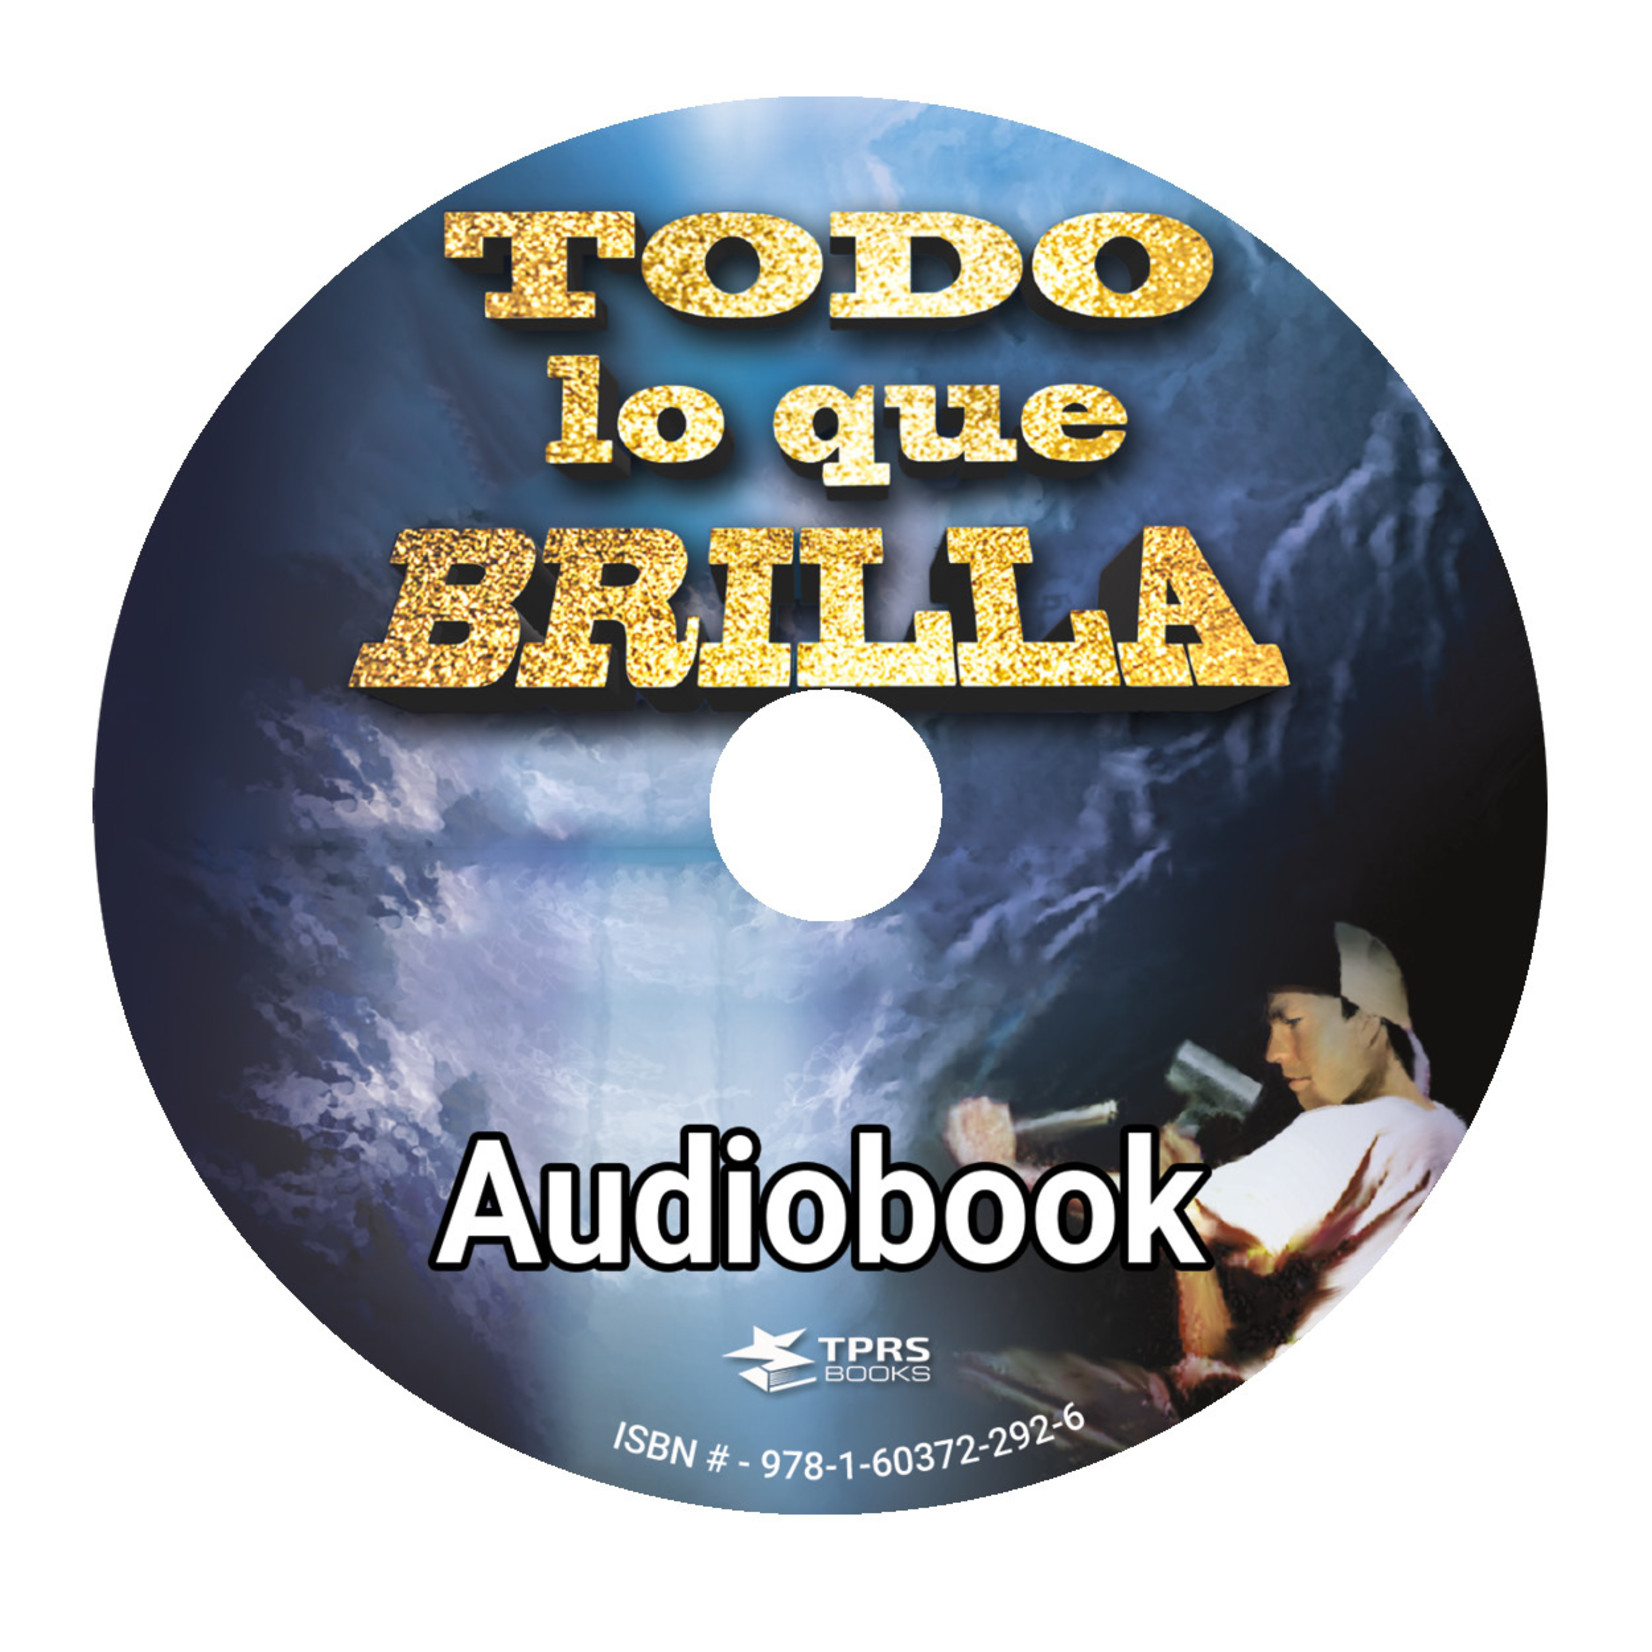 Chris Mercer Books Todo lo que brilla - Luisterboek